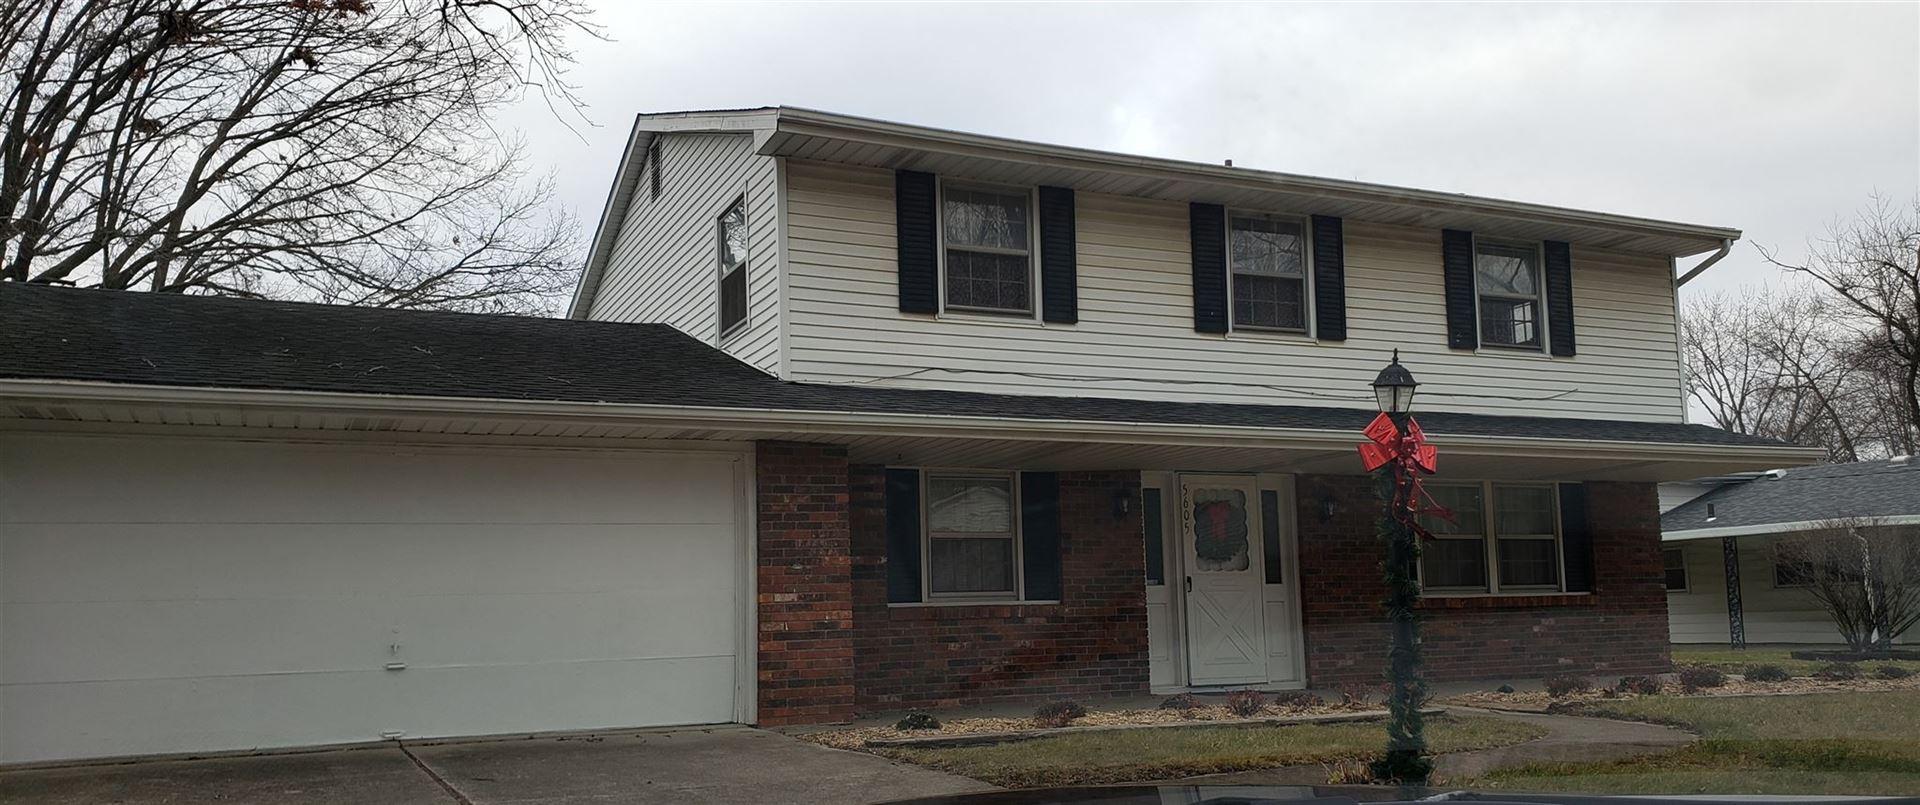 5605 Countess Drive, Fort Wayne, IN 46815 - #: 202040291